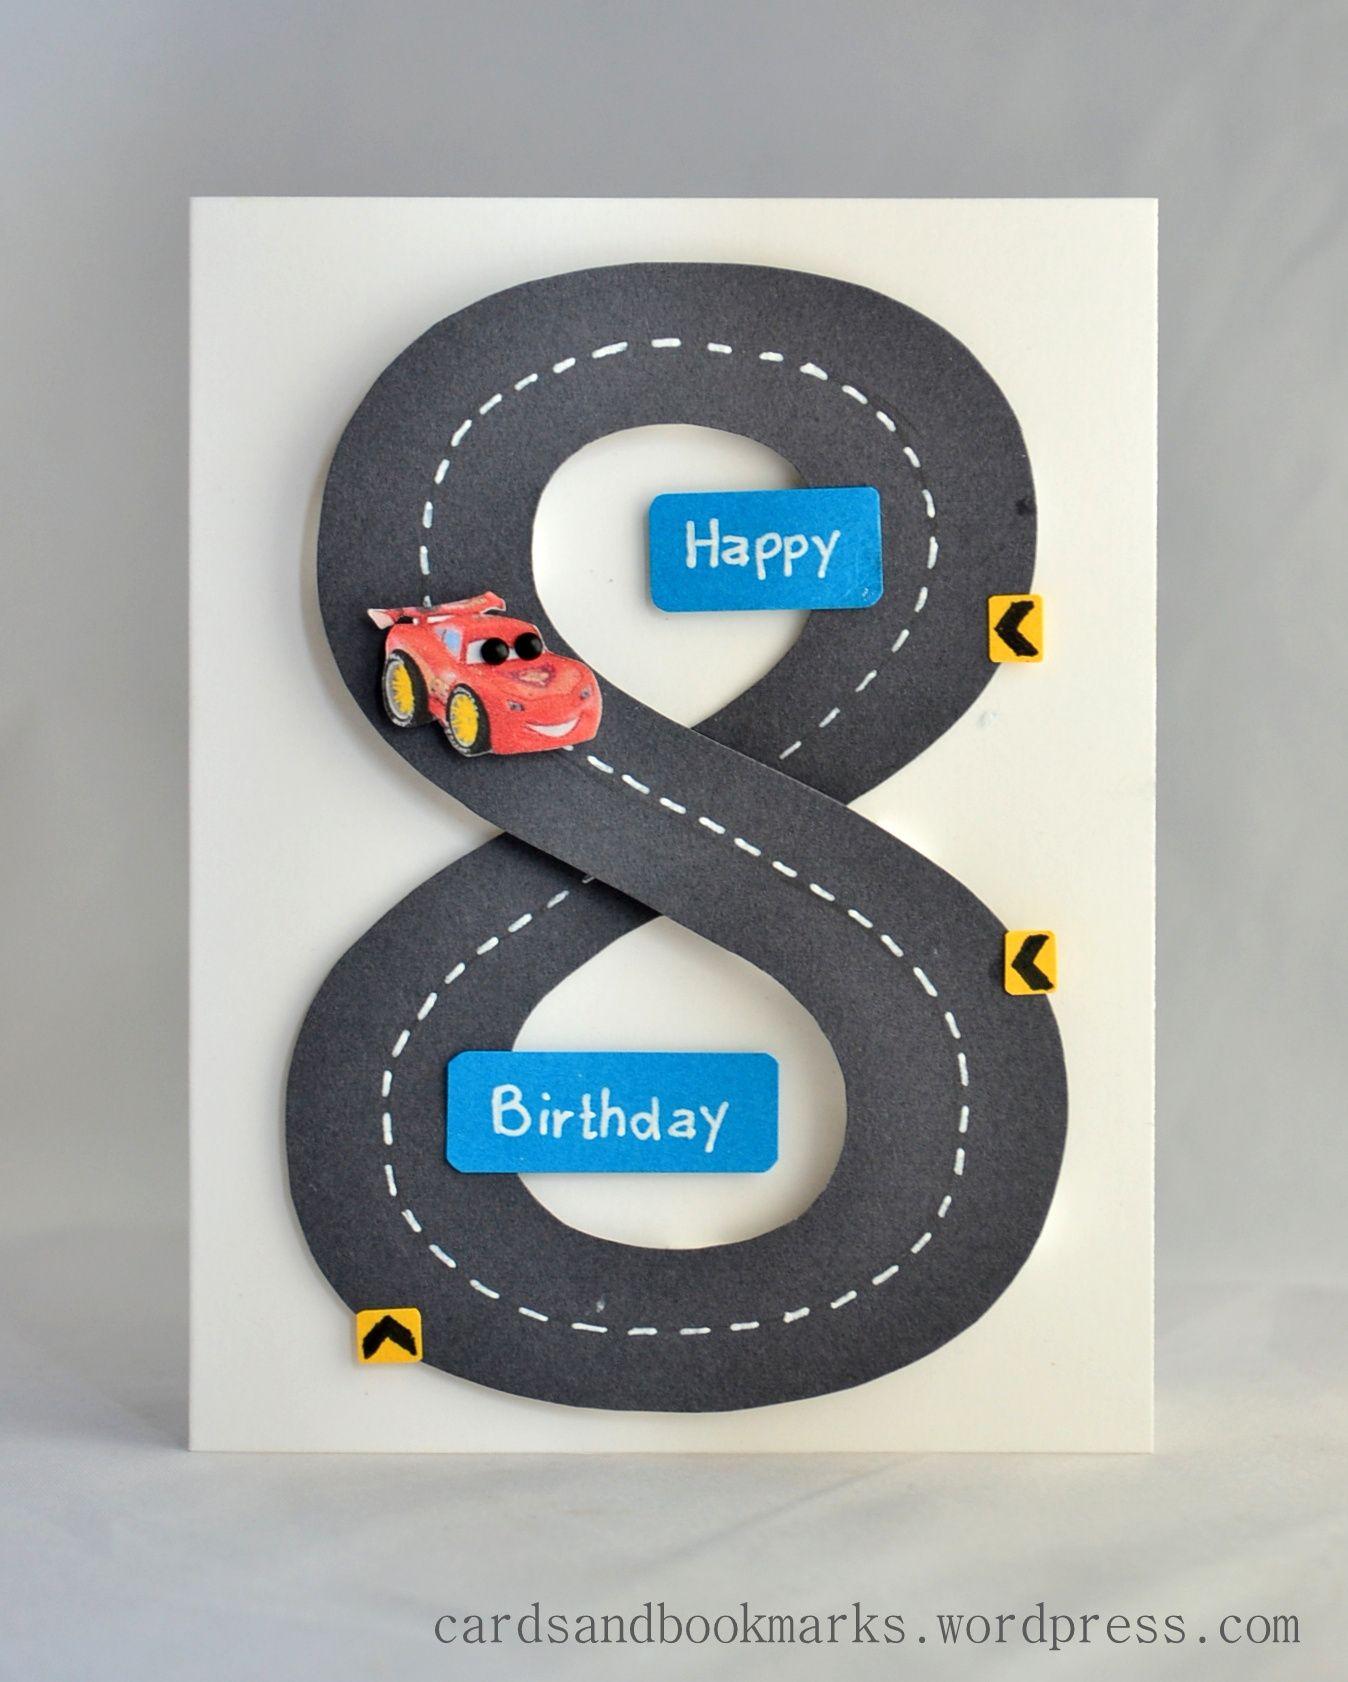 Birthday Card For 8 Year Old Boy : birthday, Birthday, Cards, Handmade,, Boys,, Handmade